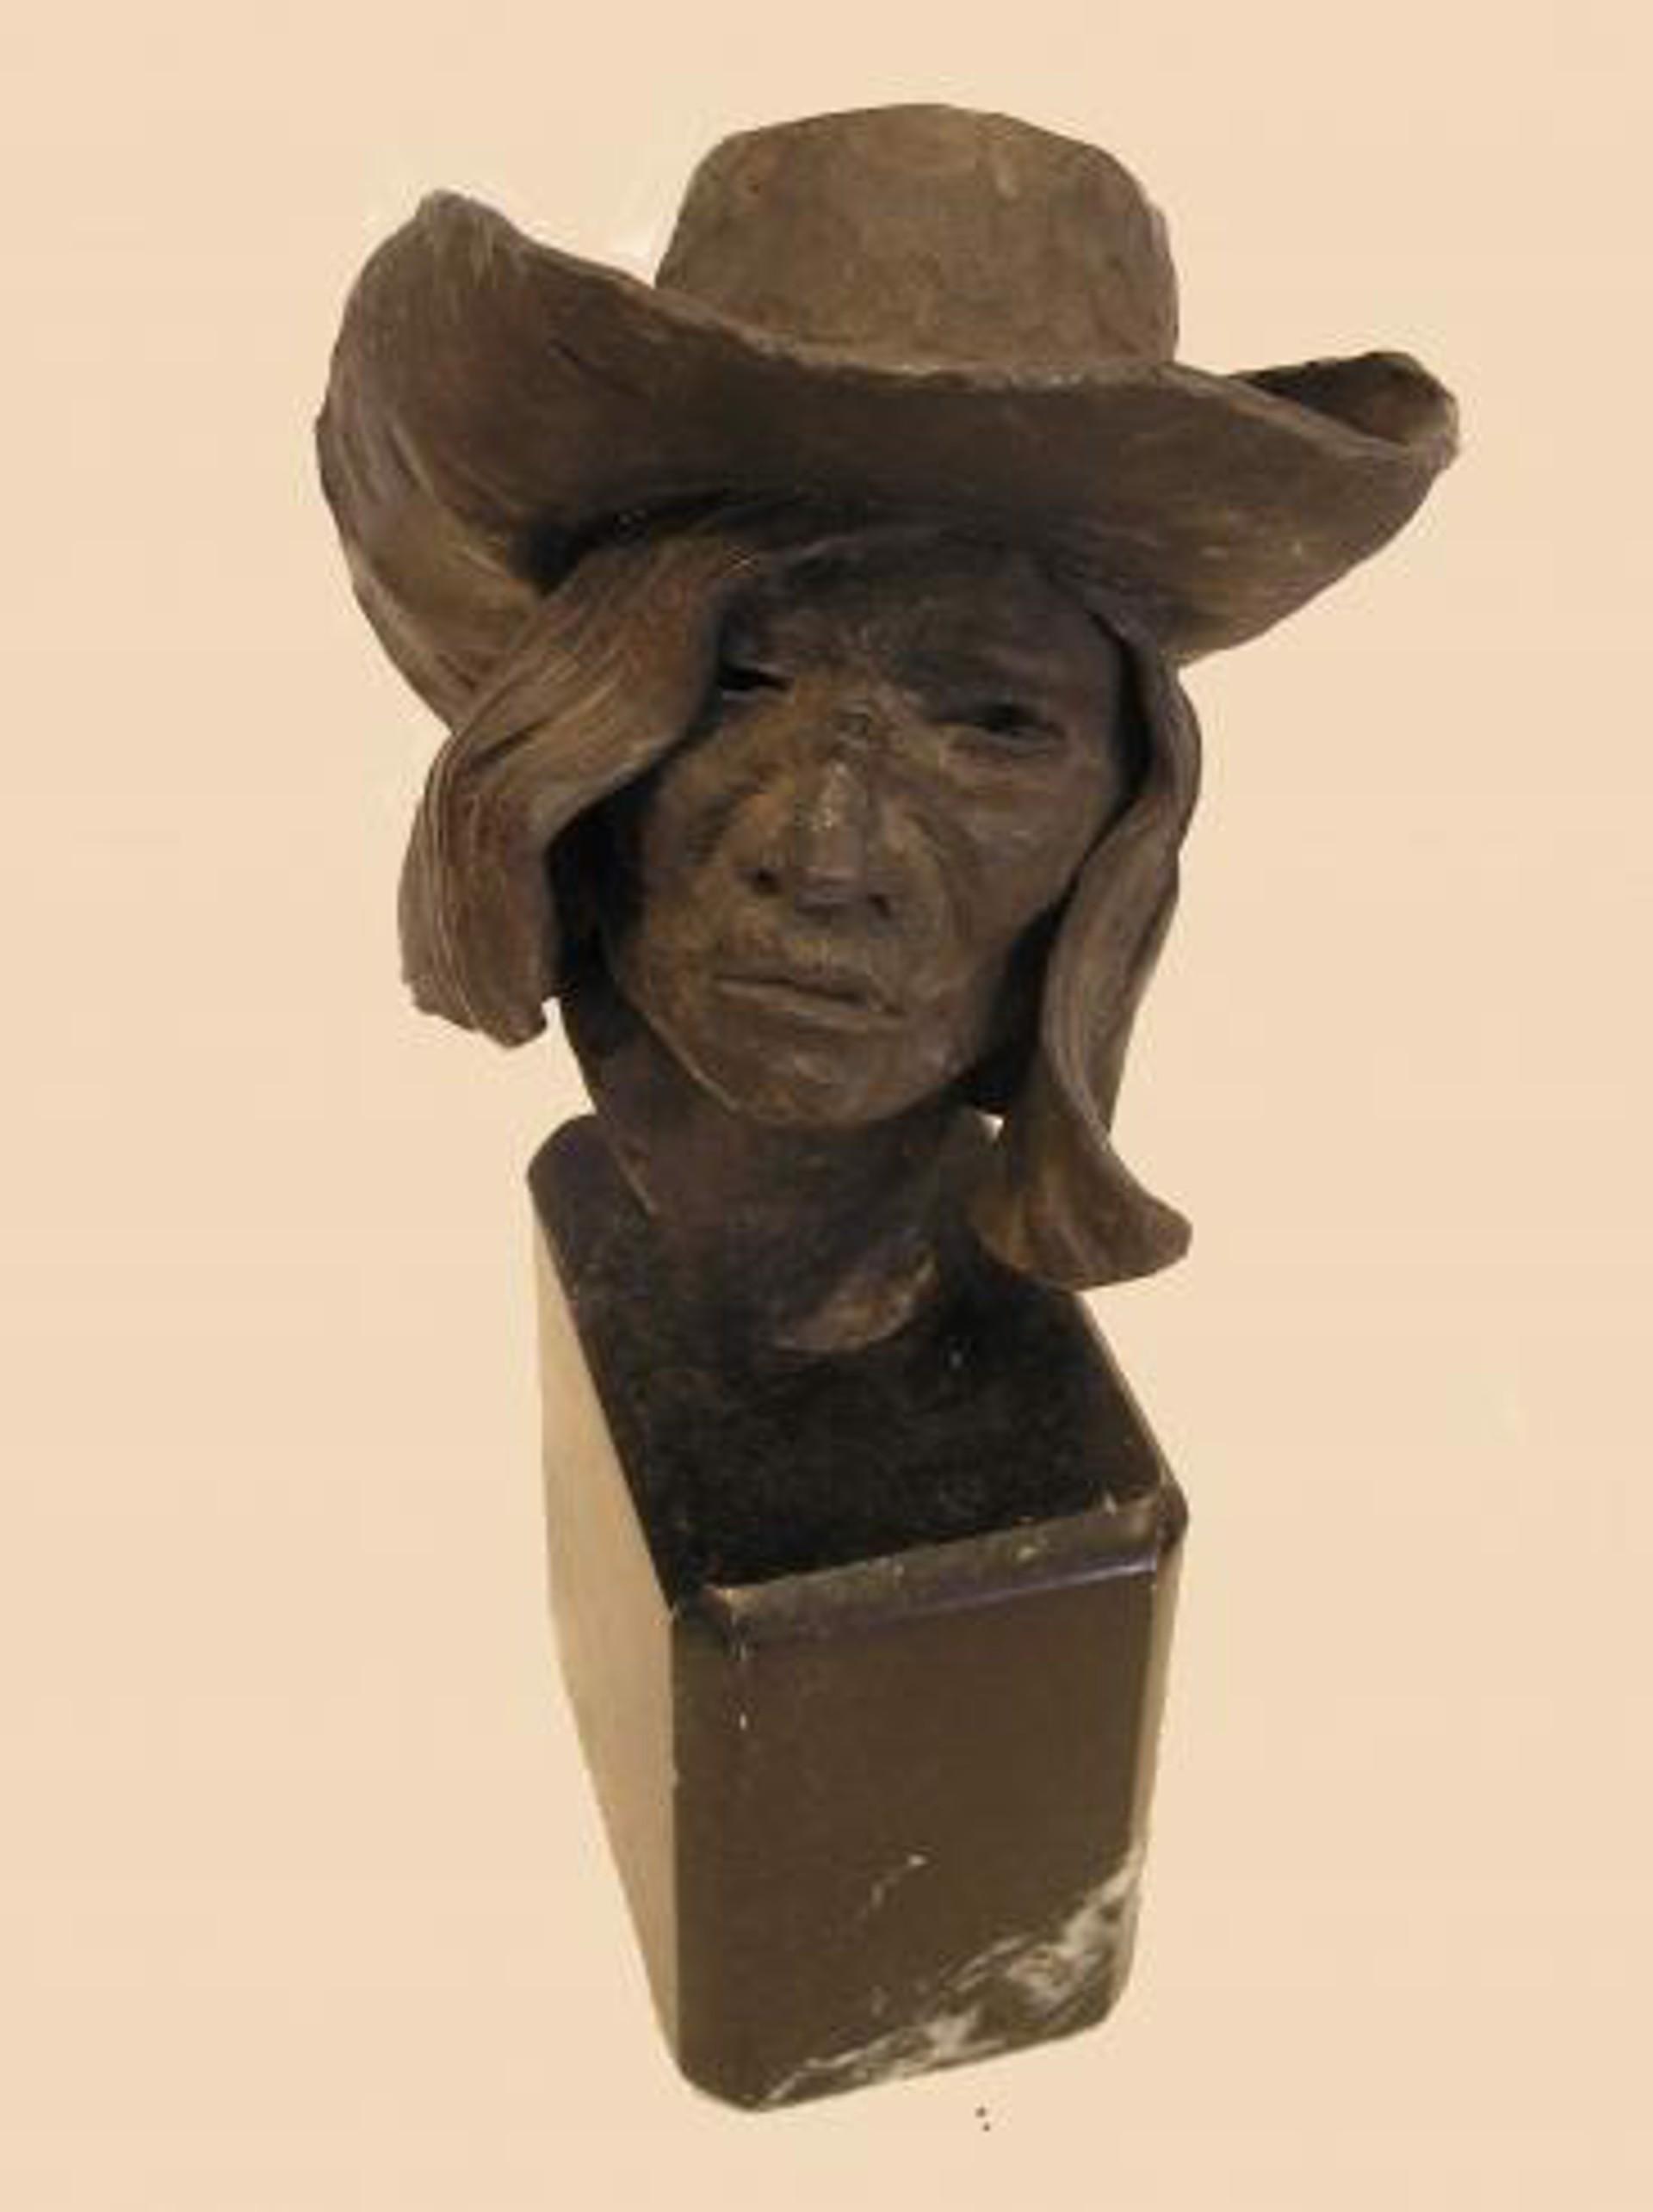 The Cowboy by Robert Wilson